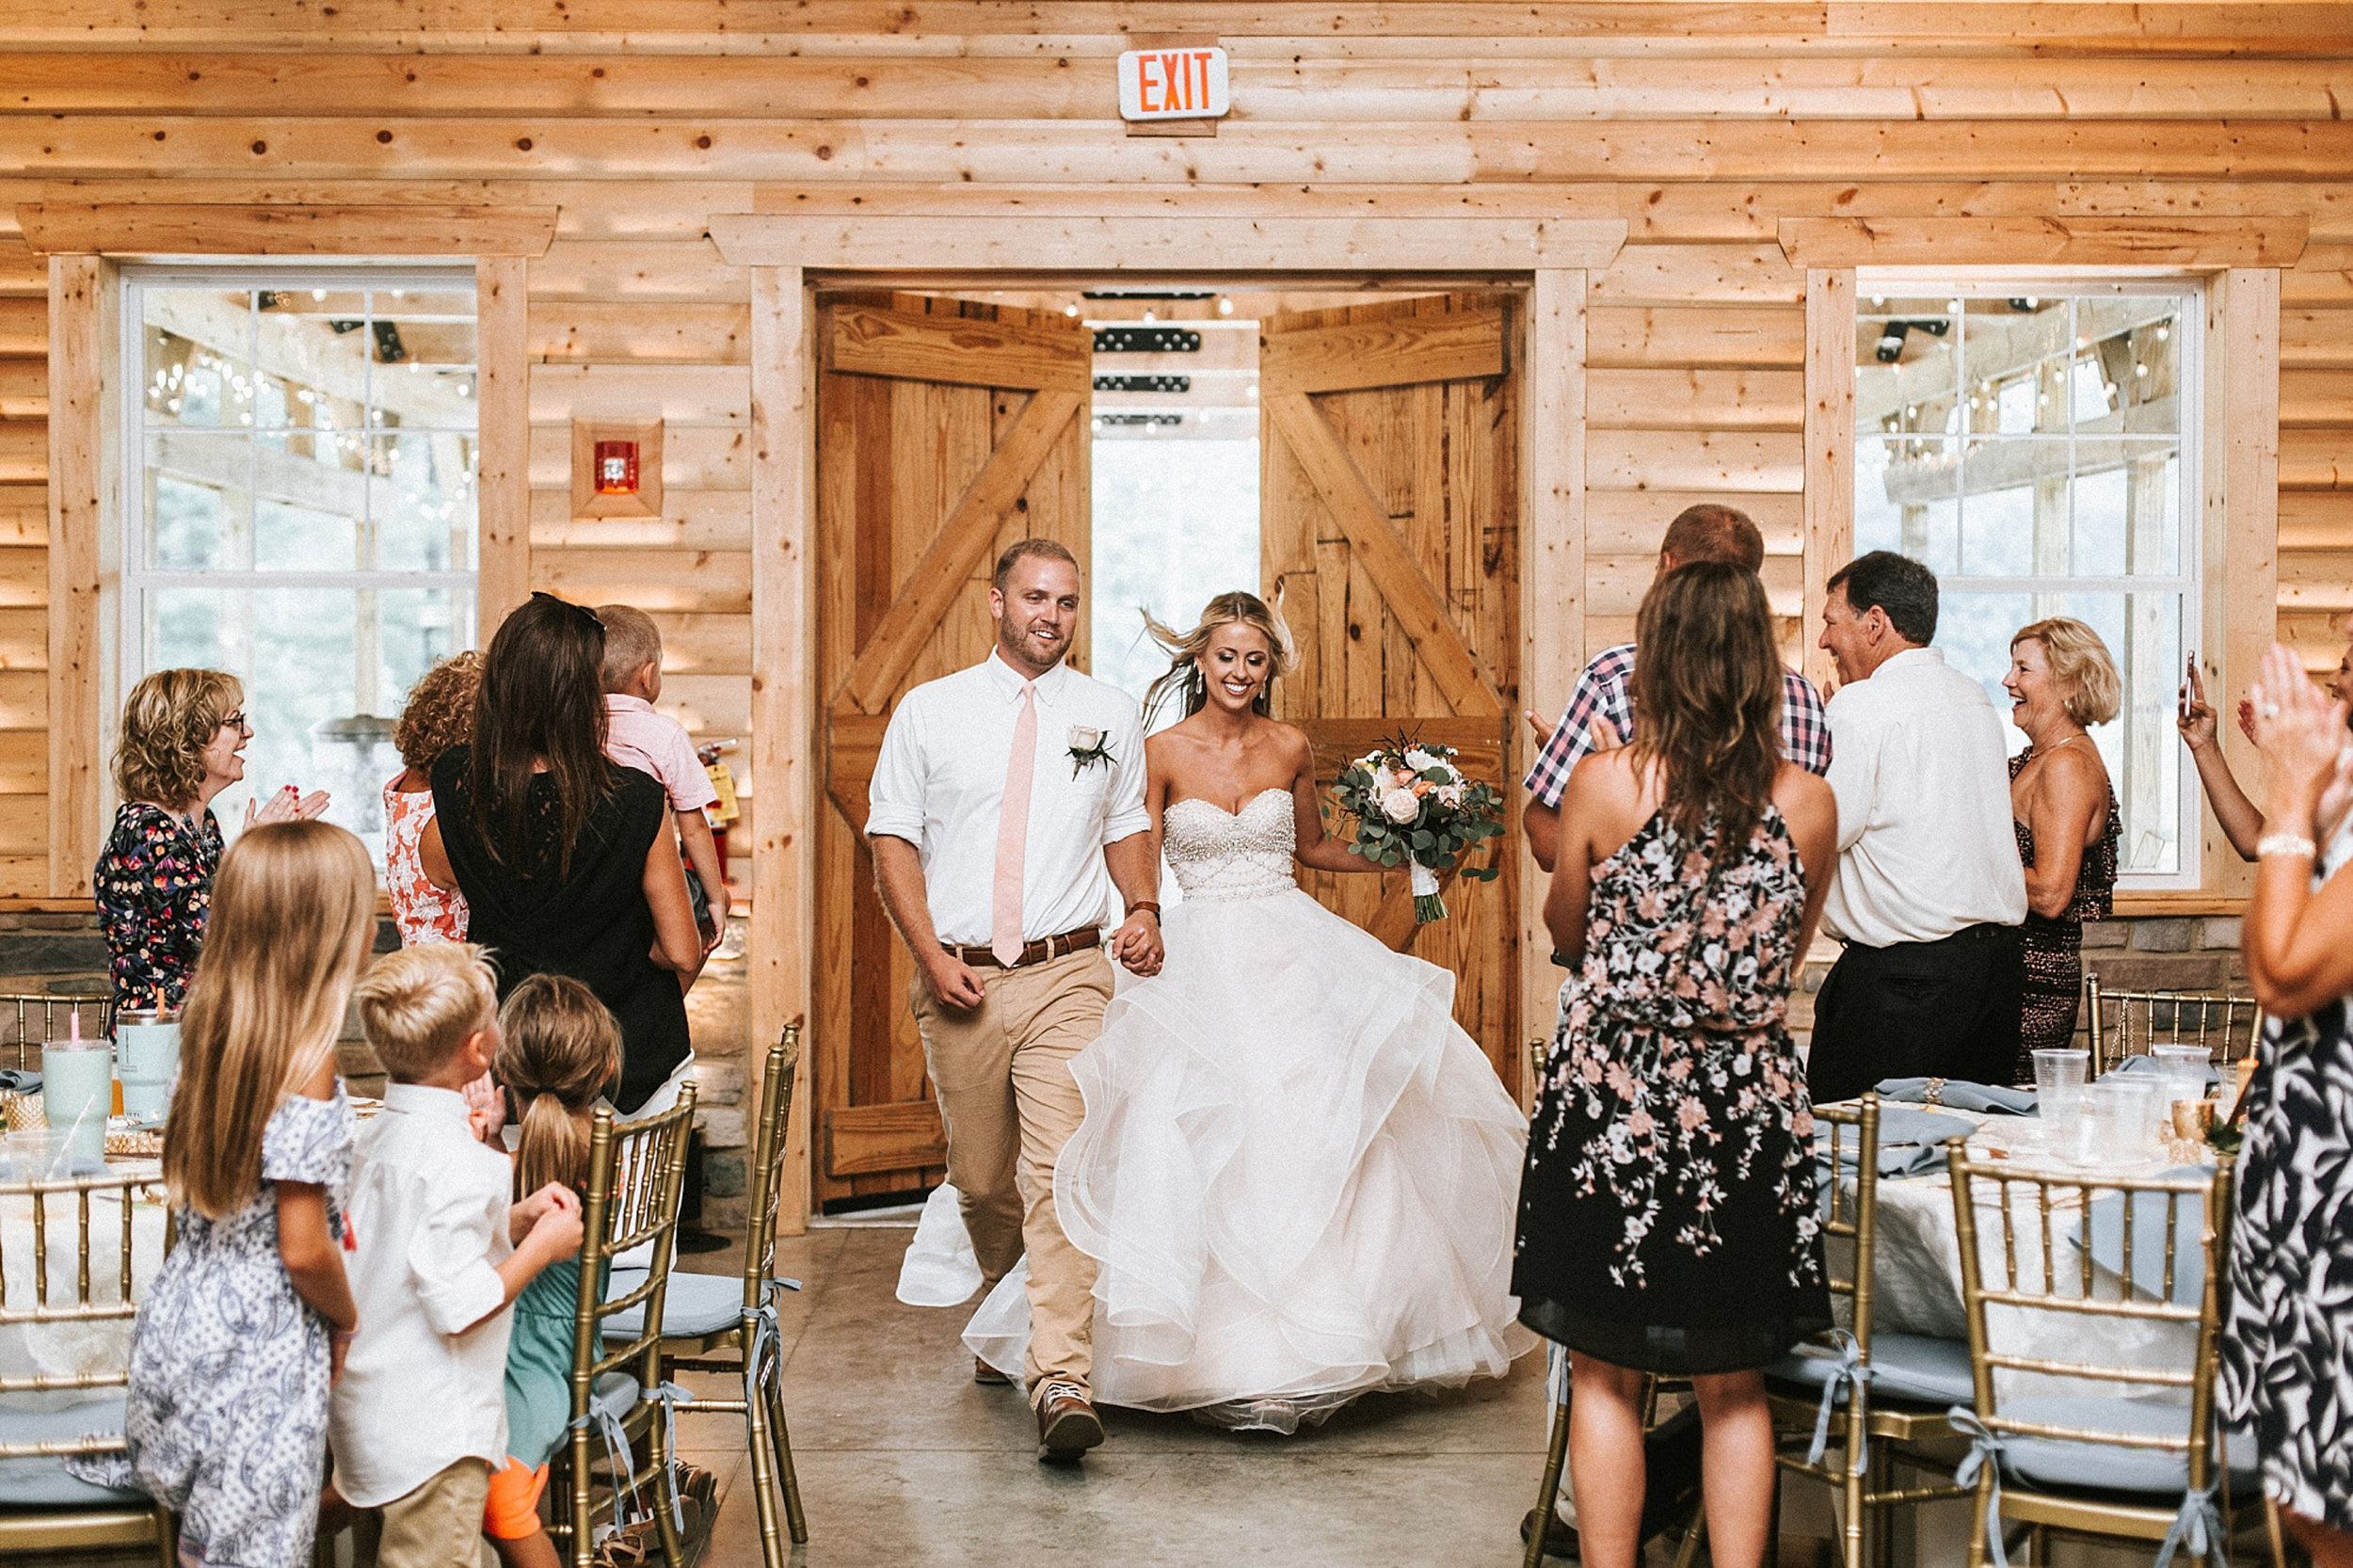 Brooke Townsend Photography - Cincinnati Wedding Photographer (126 of 153).jpg